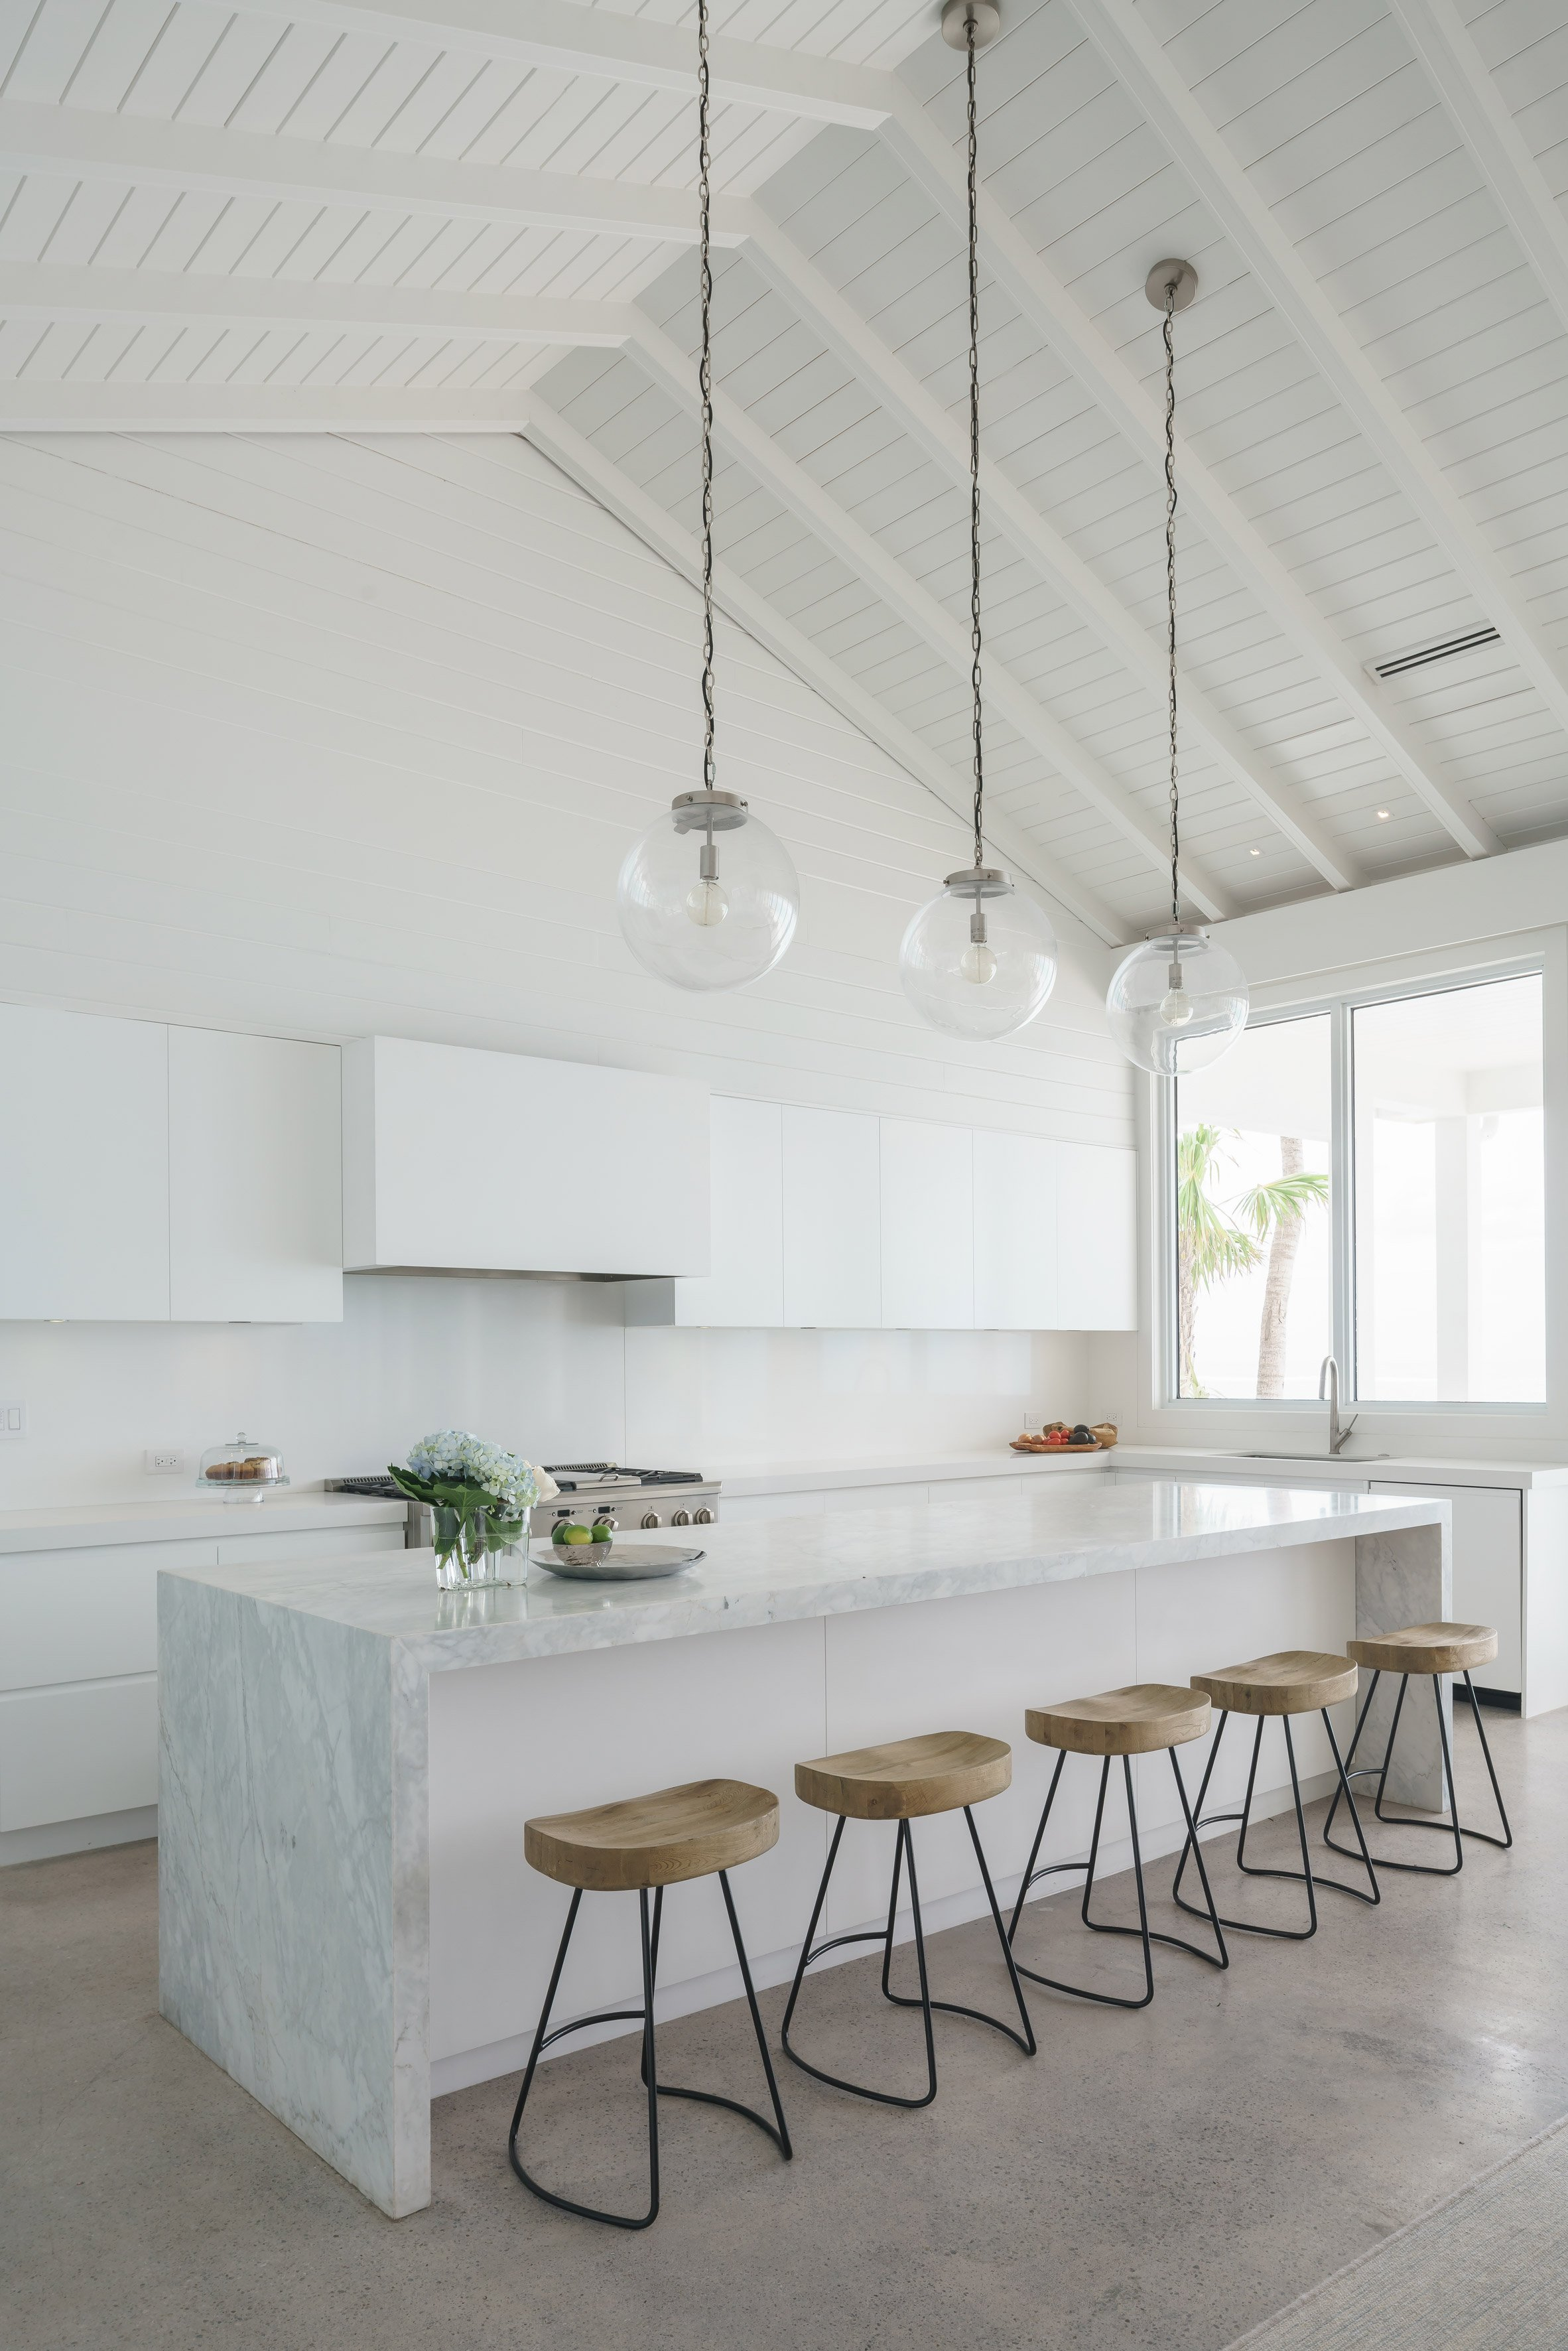 Touzet Studio Offers Modern Take On Island Architecture At Bahamas